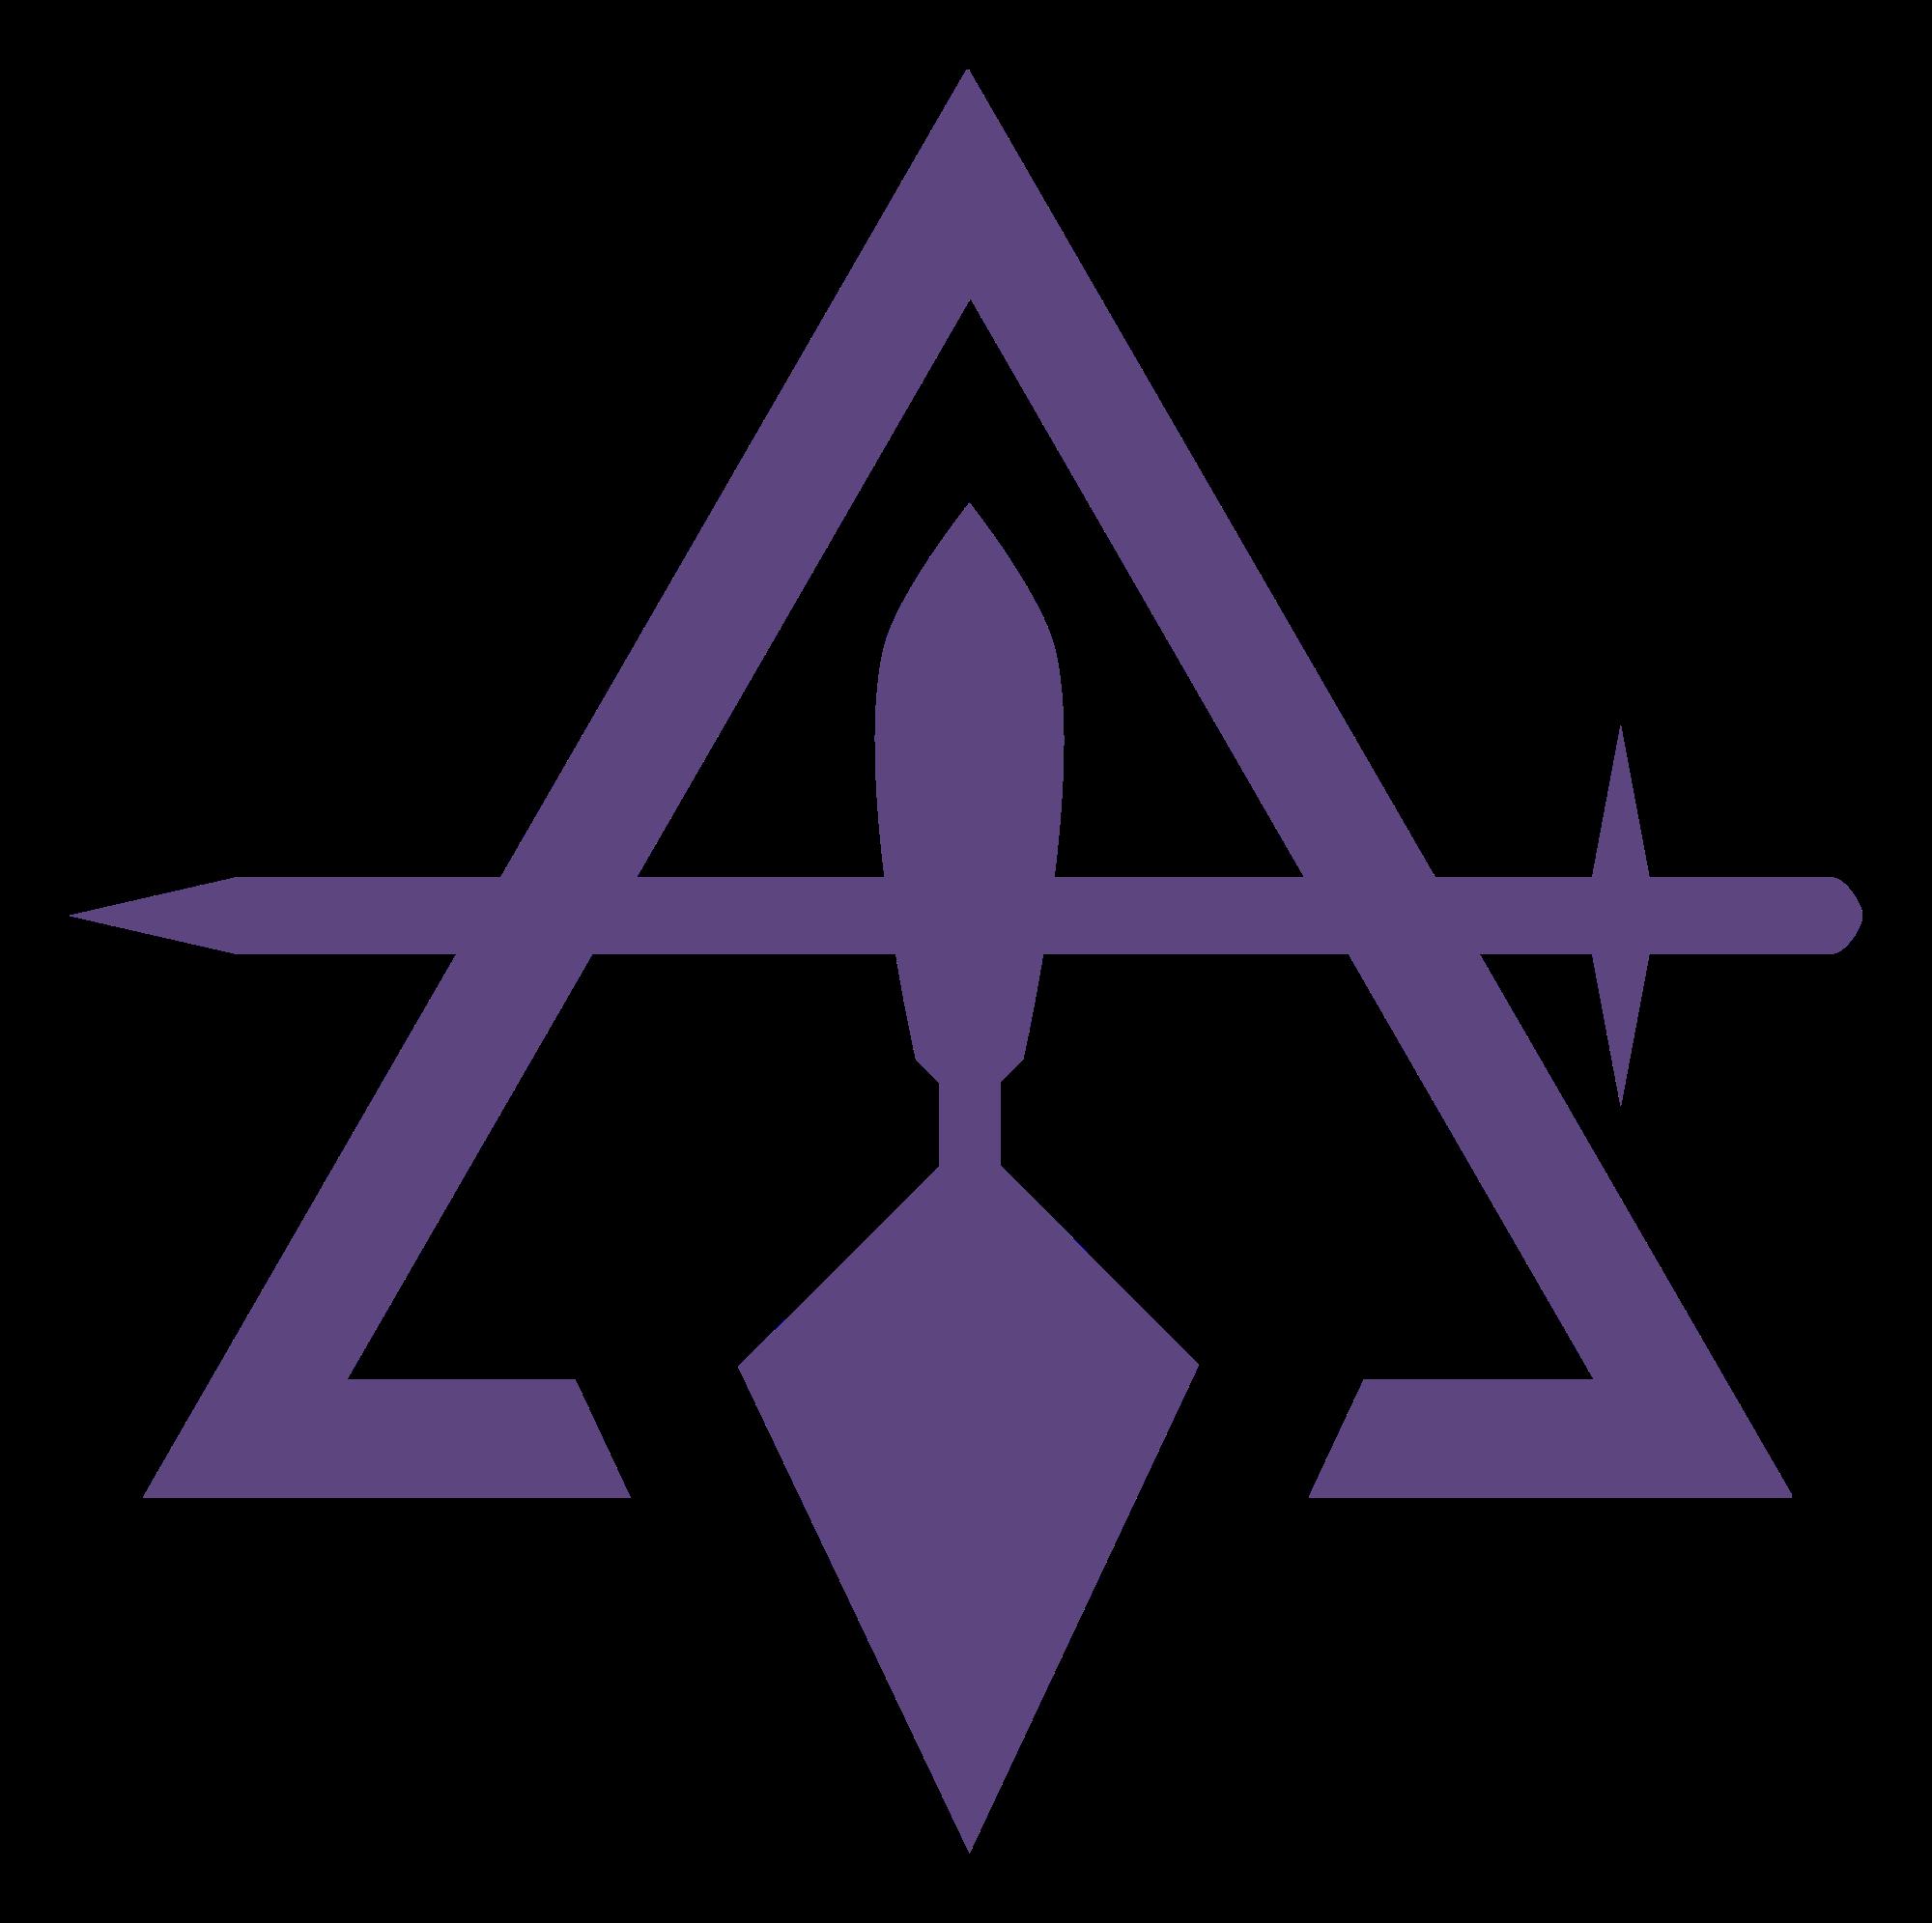 2000x1991 Filecouncil Of Royal Amp Select Masters Emblem.svg